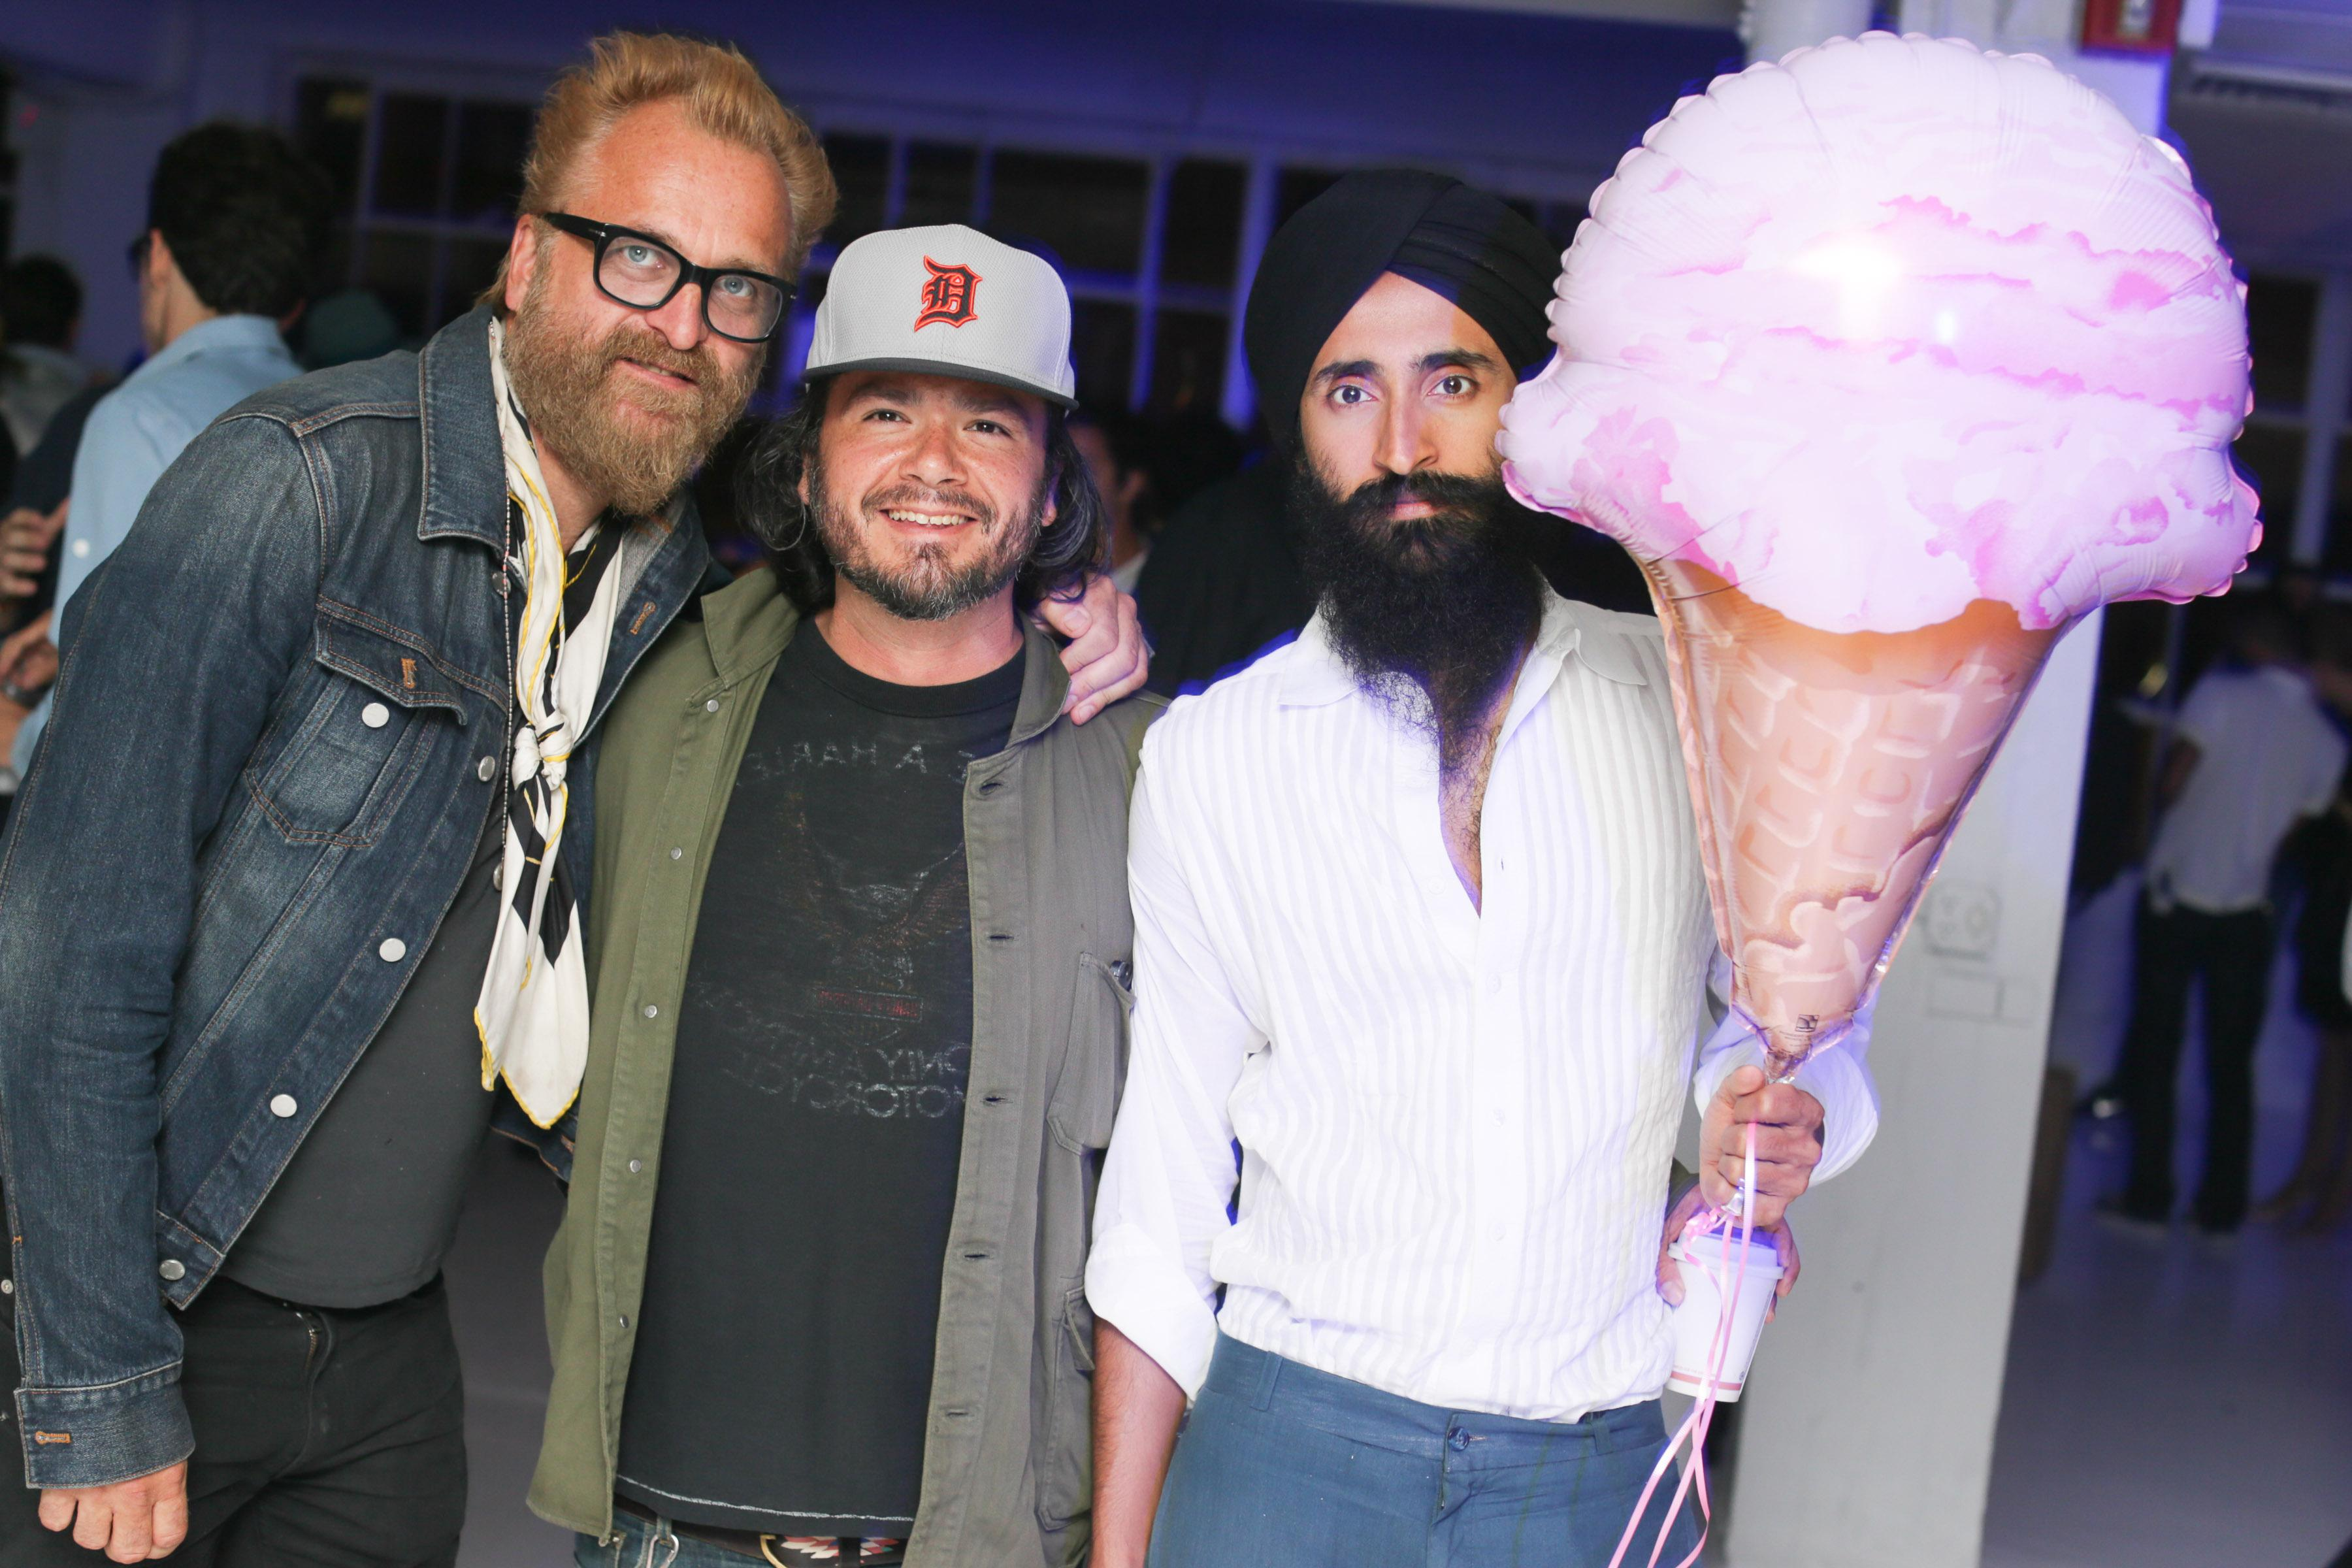 Johan Lindeberg, Carlos Quirarte, Waris Ahluwalia - CHELSEA LEYLAND'S Birthday Bash Presented by DKNY JEANS